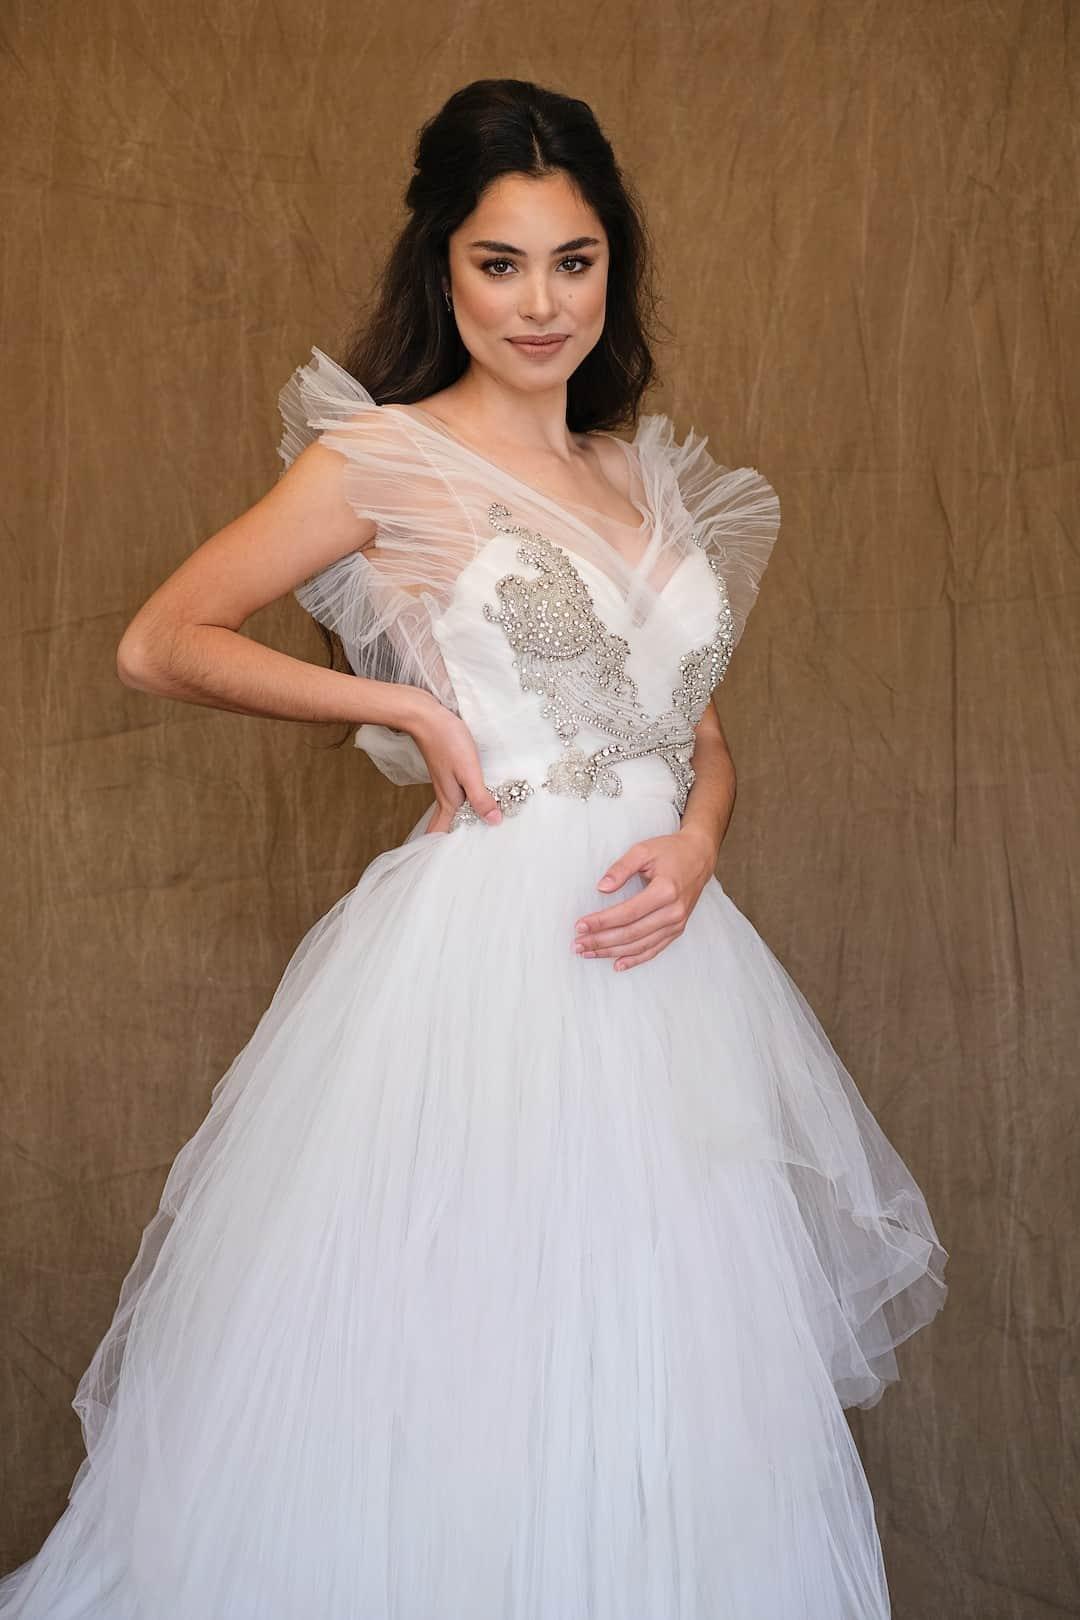 Romantic wedding dress - Marco&Maria - 14-1031-front-top